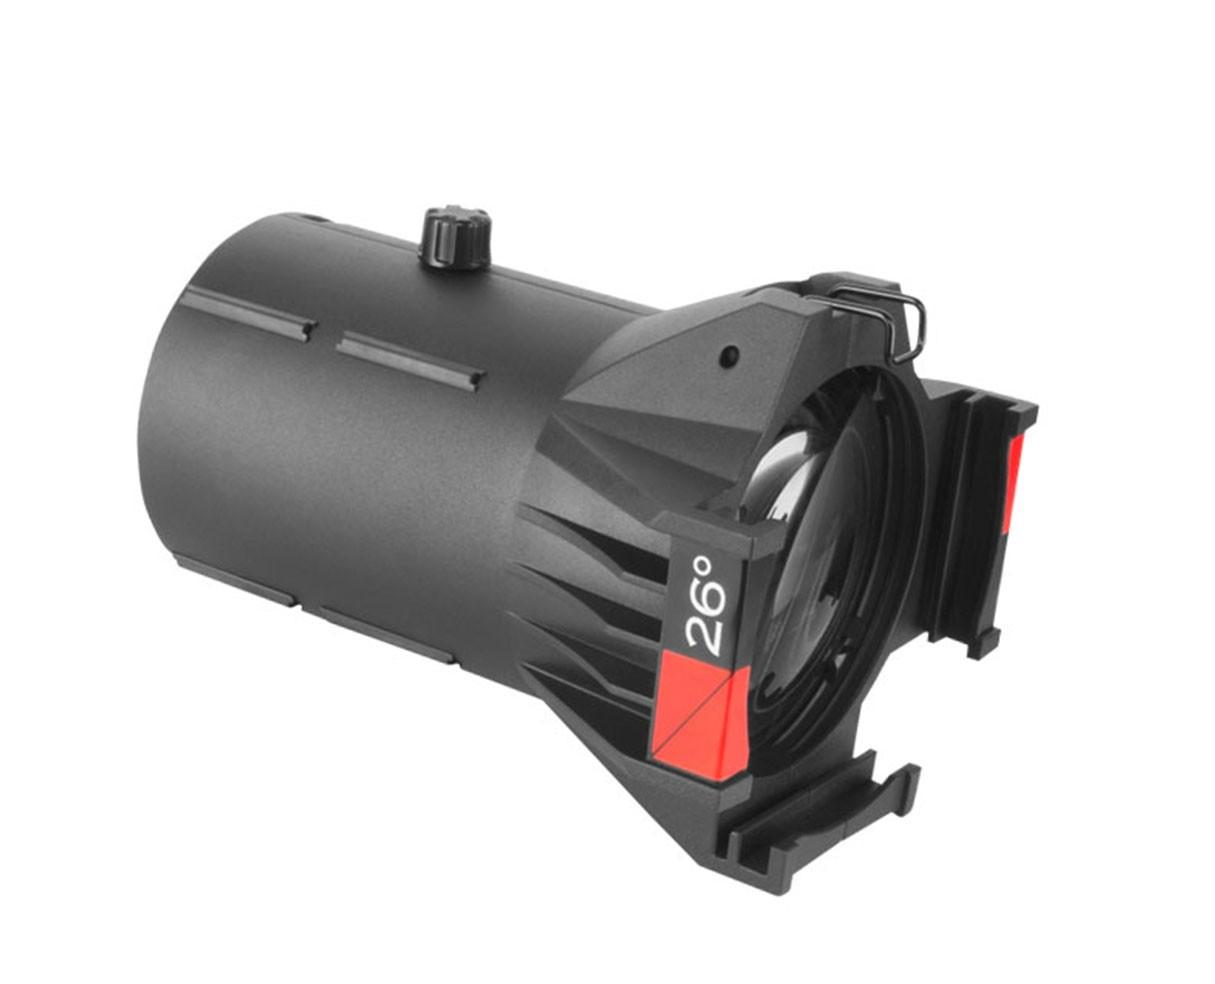 CHAUVET Professional 26 Degree Ovation Ellipsoidal HD Lens Tube